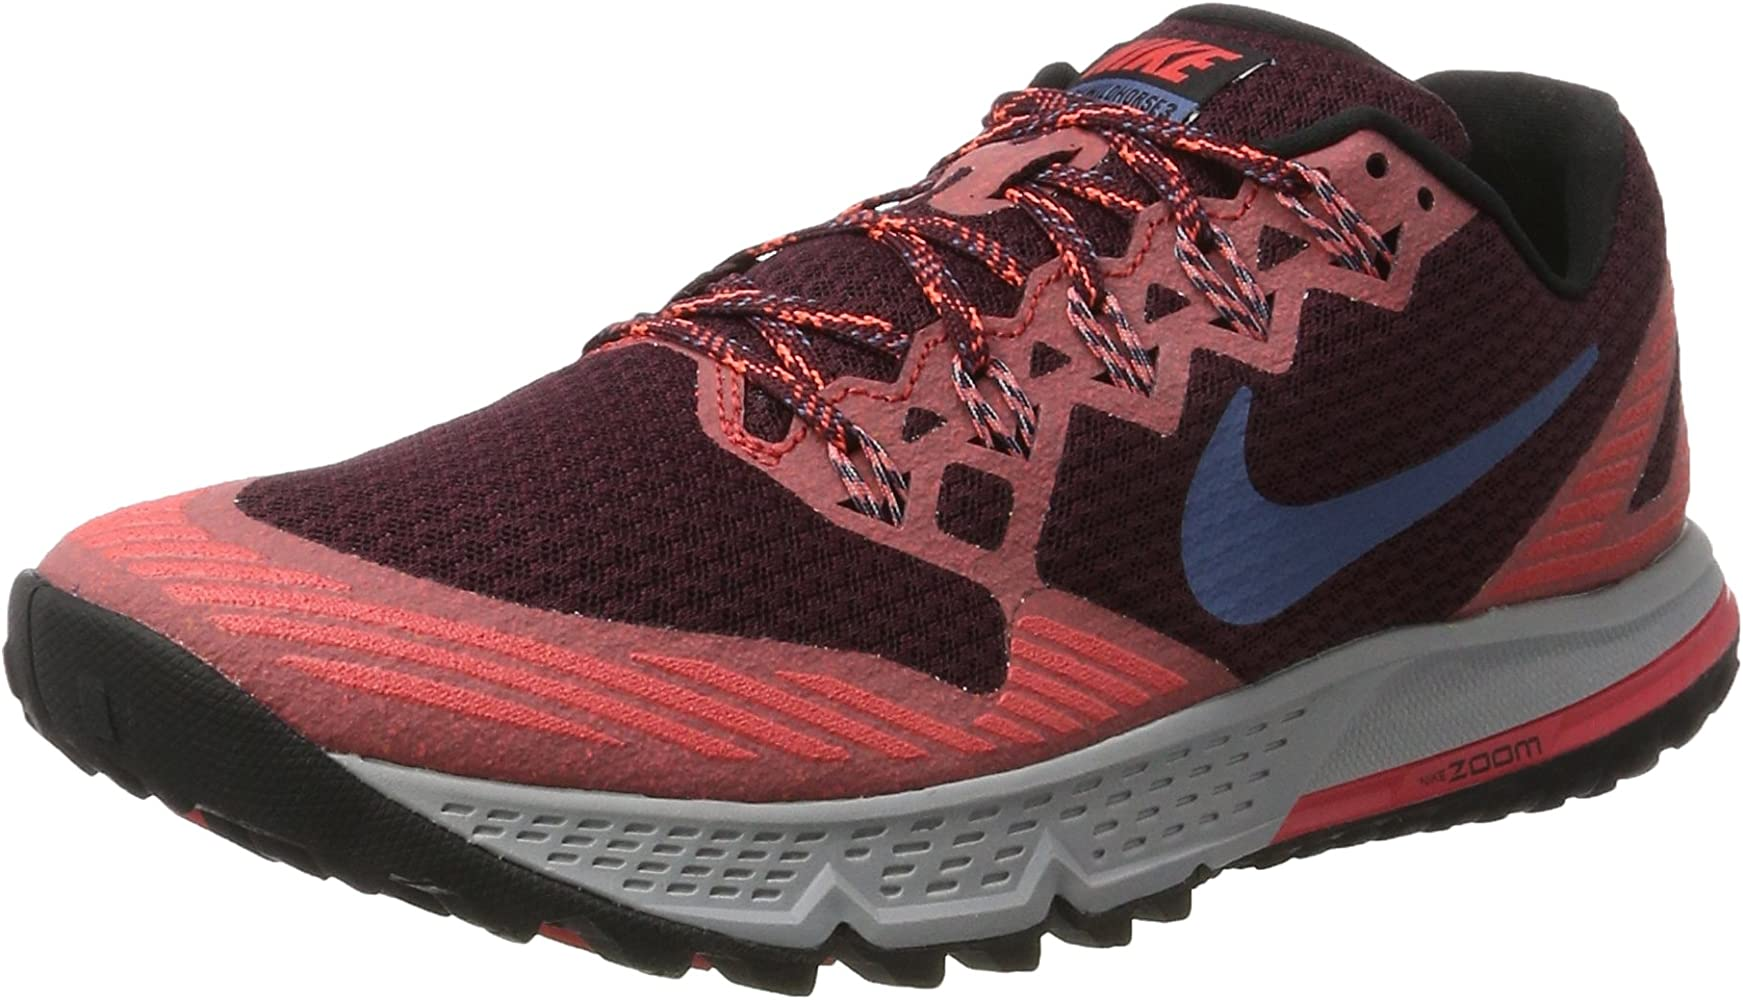 Nike 749336-600, Zapatillas de Trail Running para Hombre, Rojo ...